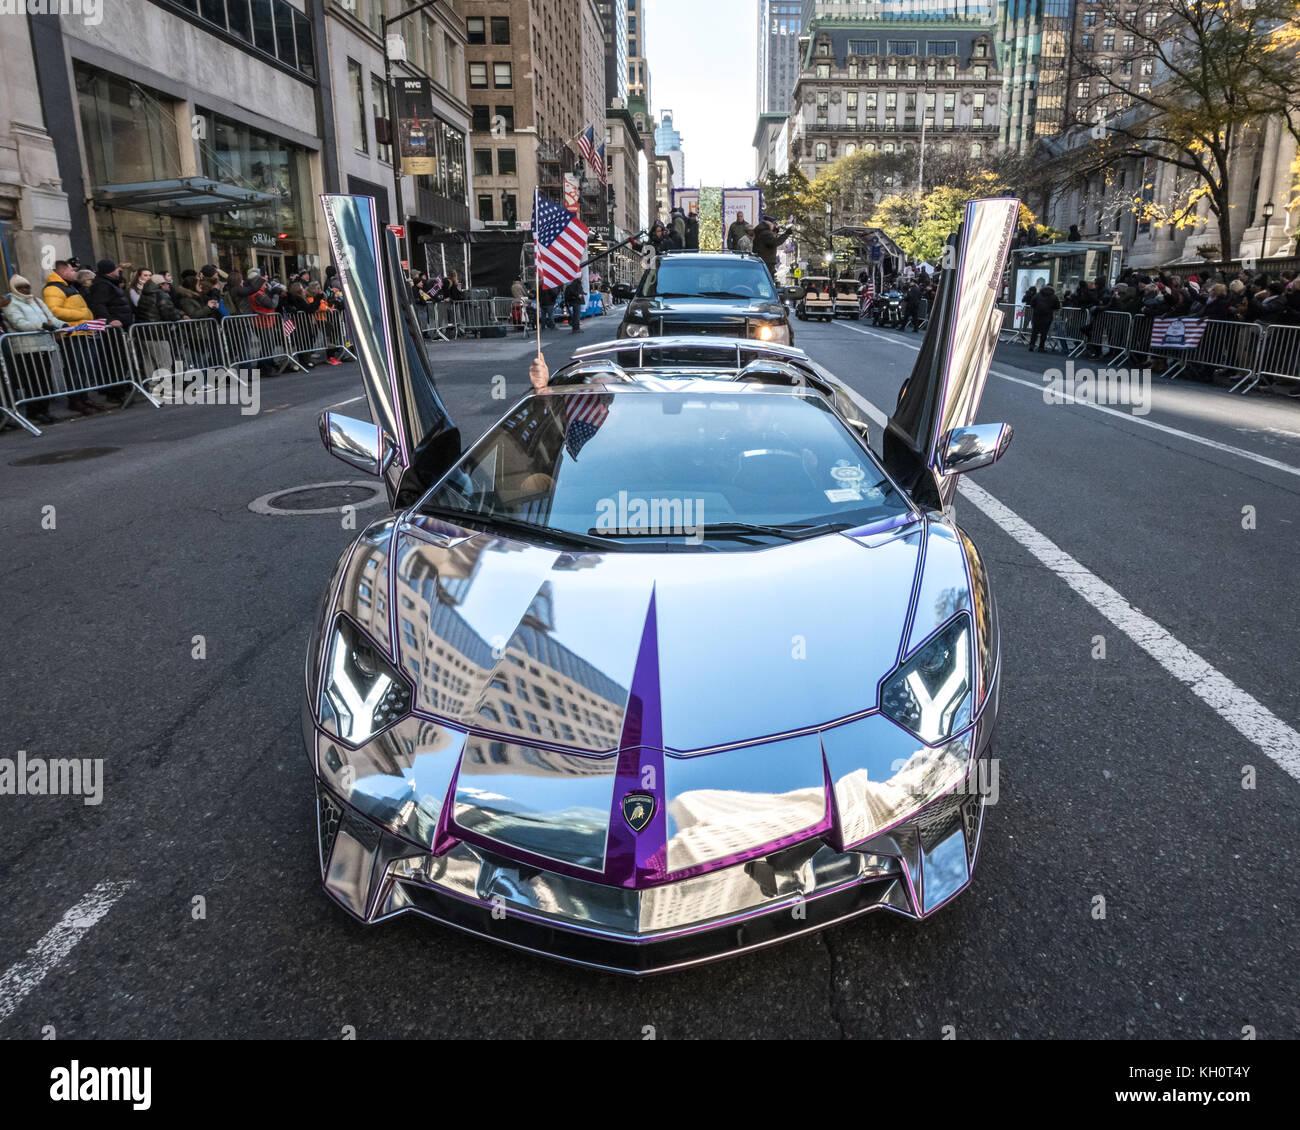 Lamborghini For Sale Ny: Lamborghini Aventador Sports Car Stockfotos & Lamborghini